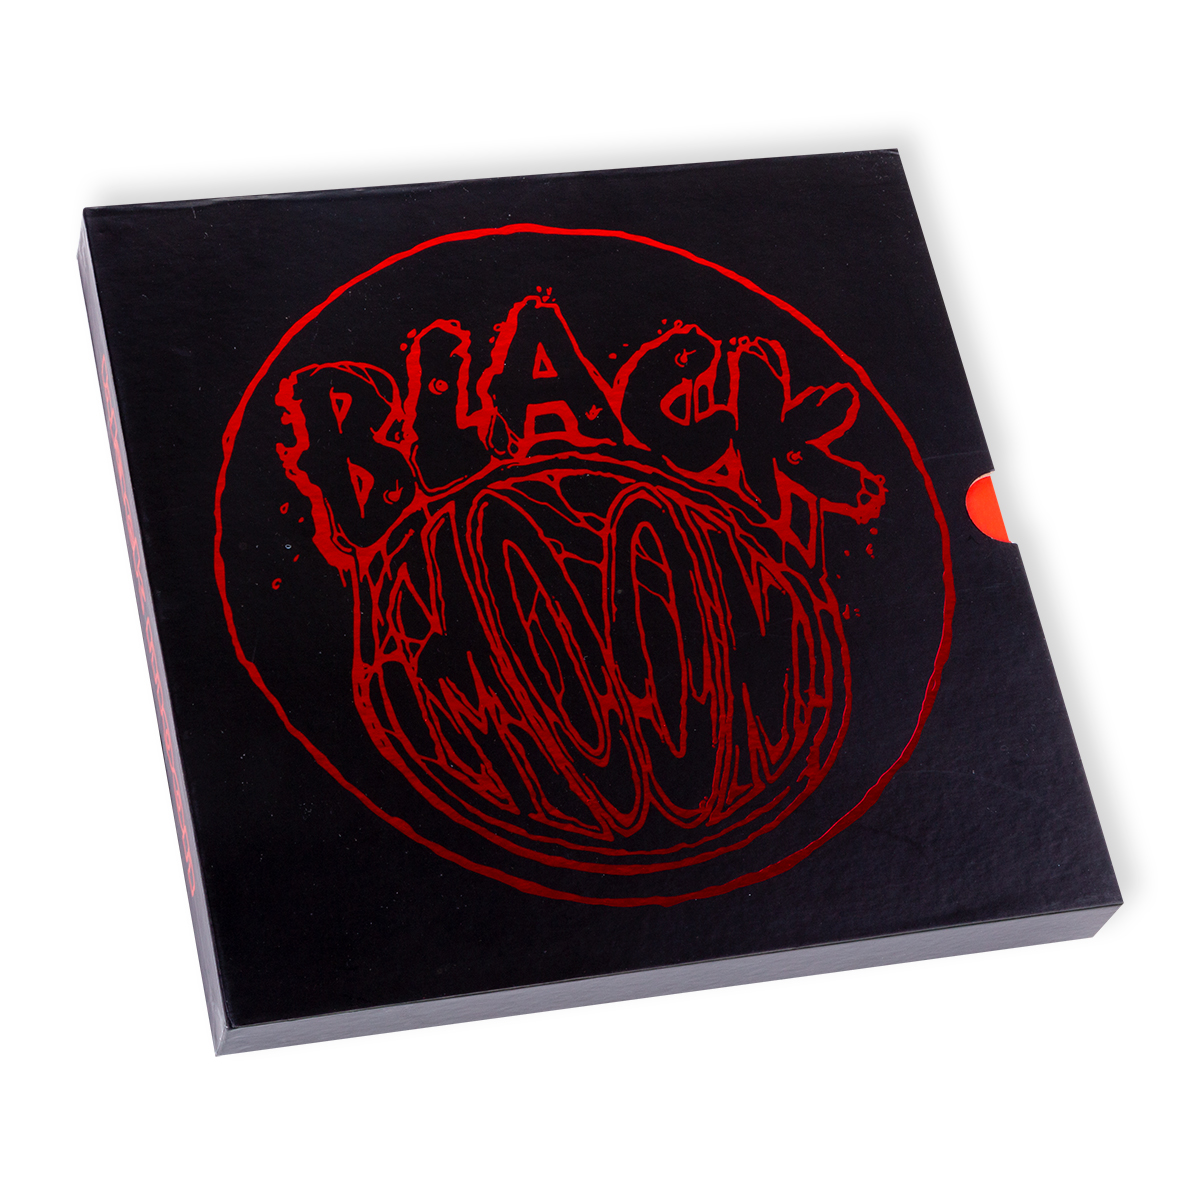 Black Moon - Enta Da Stage: The Complete Edition (6 LP Box Set)